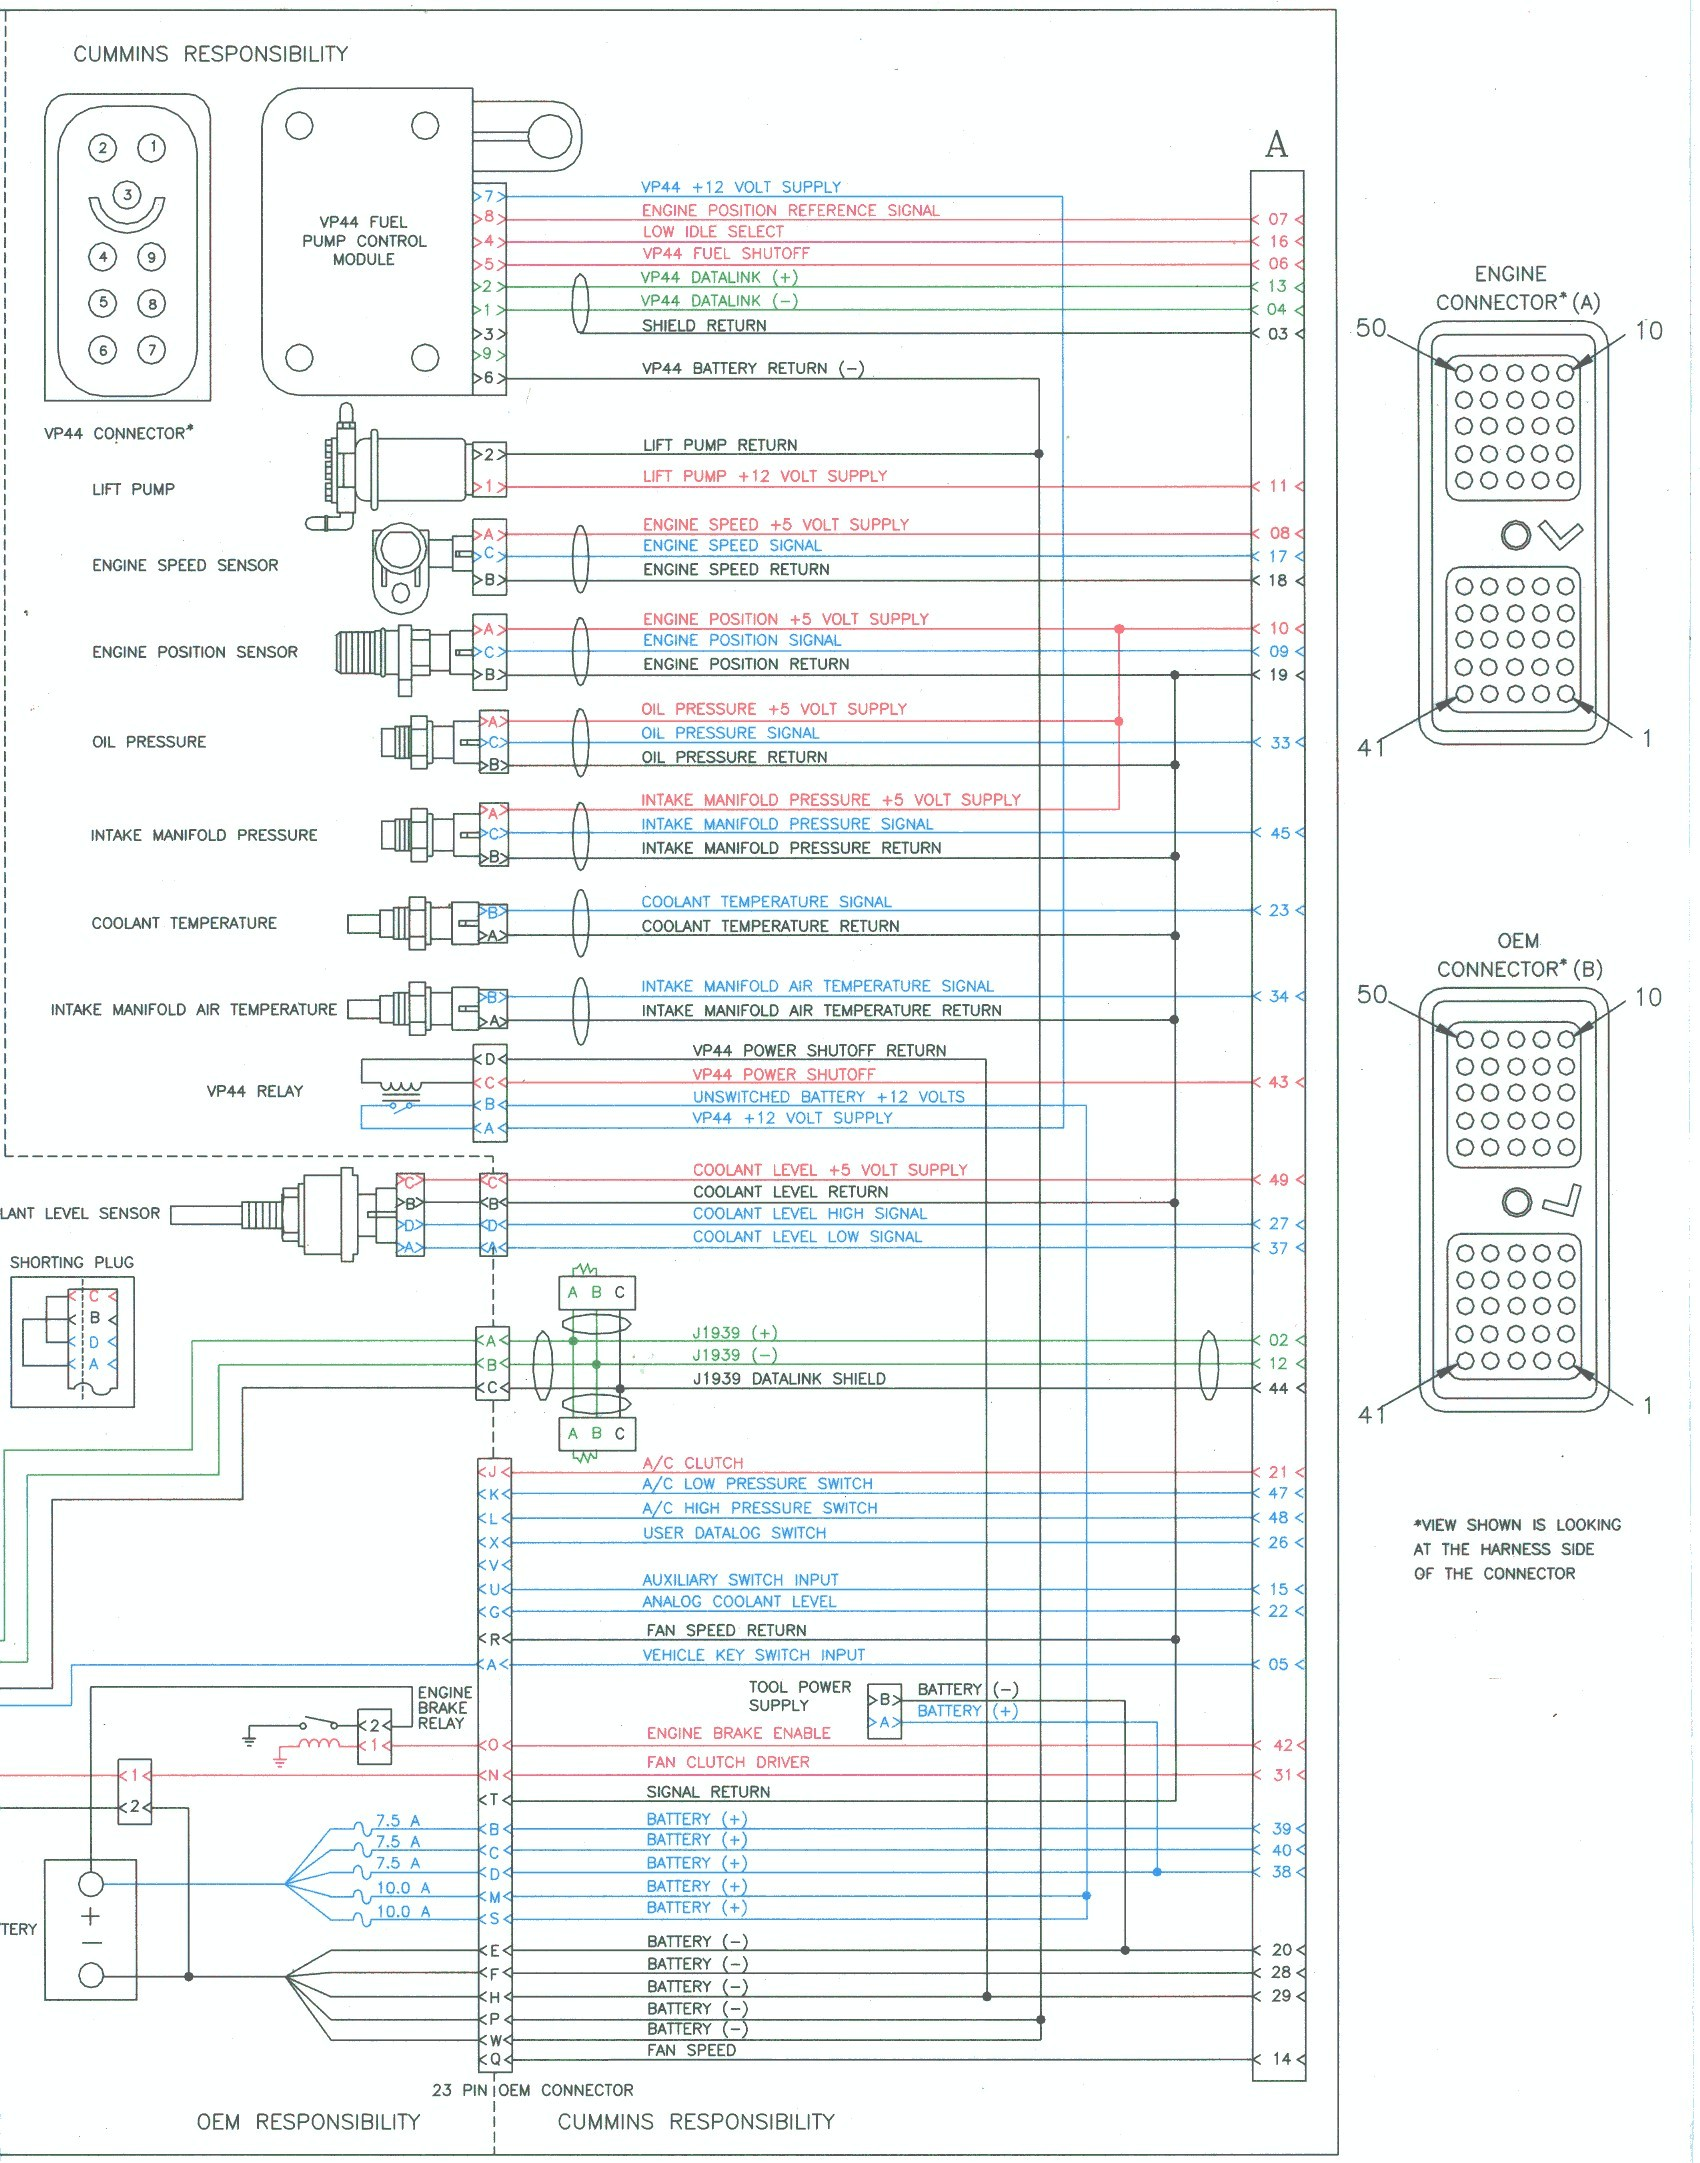 Radio Wiring Diagram For 2003 Oldsmobile Alero Best Electrical 2001 Dodge Ram Awesome Image Speaker